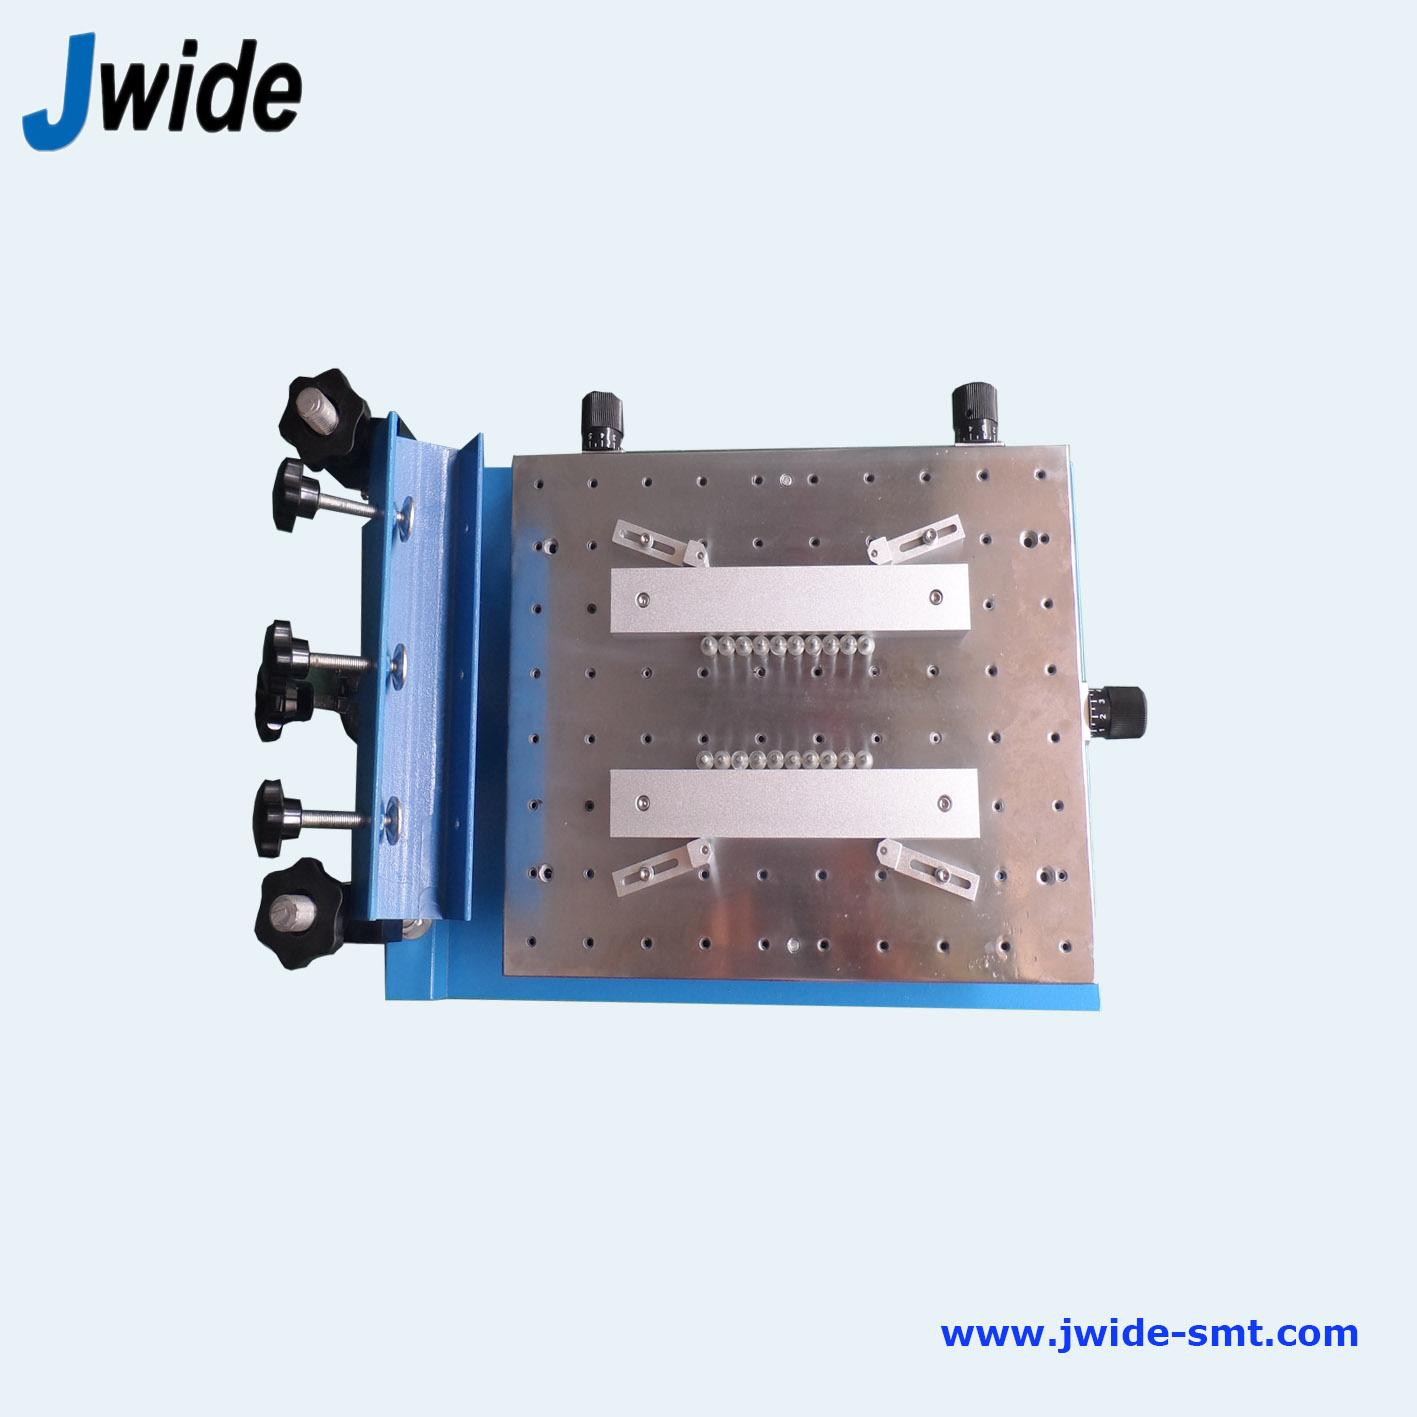 3040 Manual Solder Paste Stencil Printer-SMT PCB Printing Machine 300x400mm USA